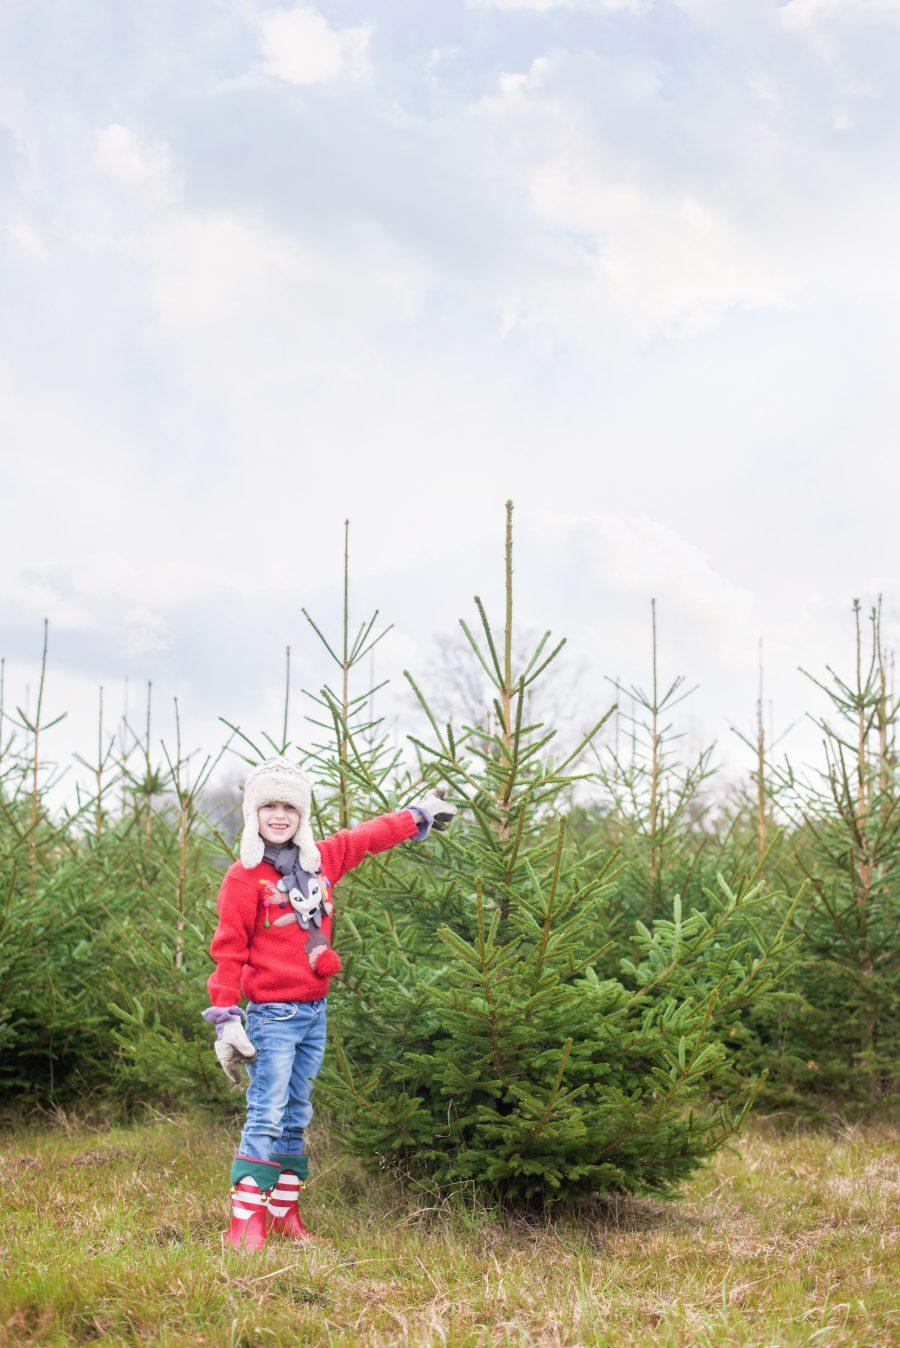 Headlands Farm Fishery Christmas Tree Farm